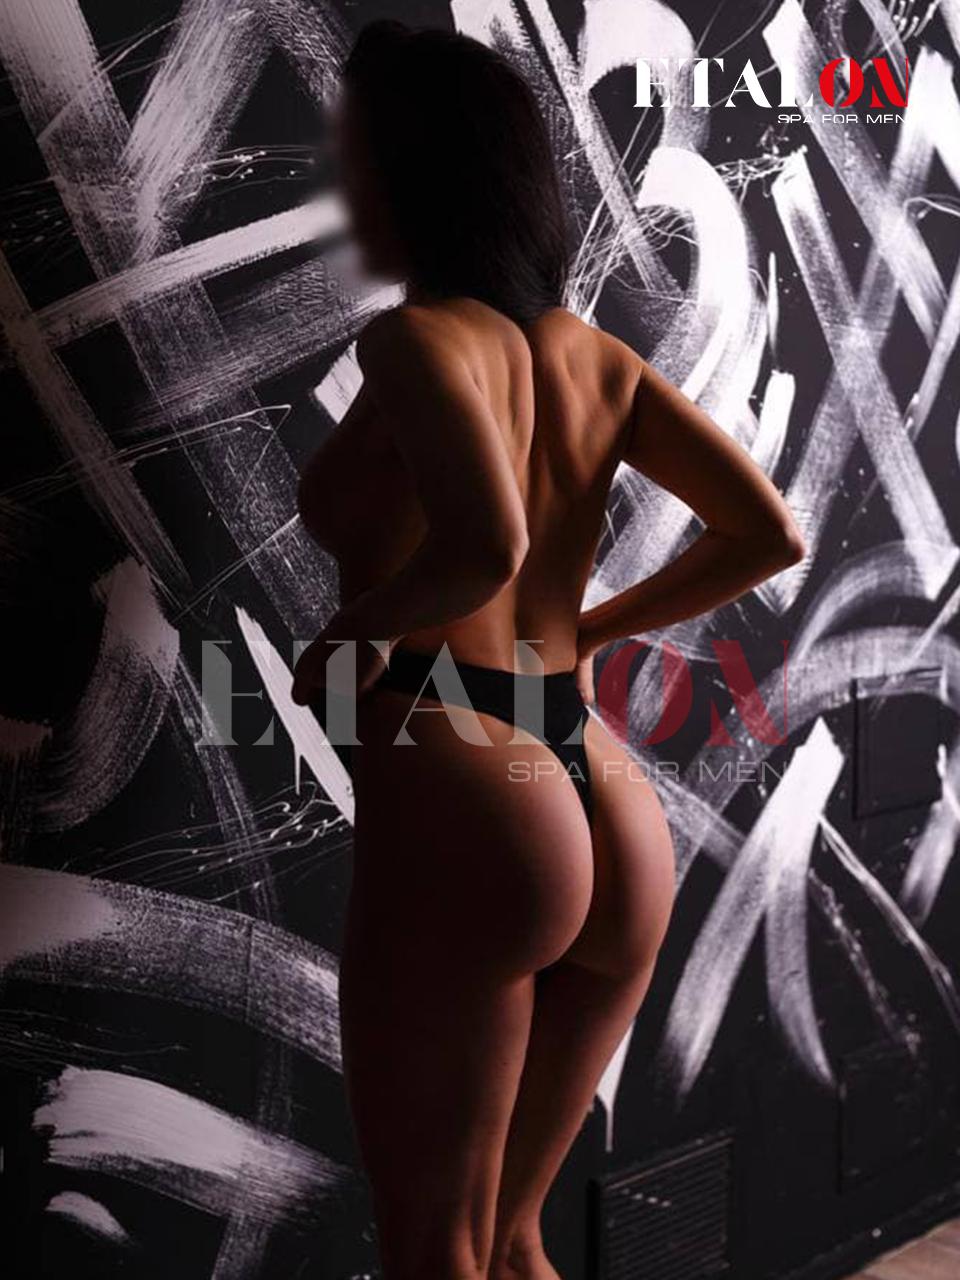 Картинка Erotic massage in Moscow – all kinds of male pleasure in the Etalon salon